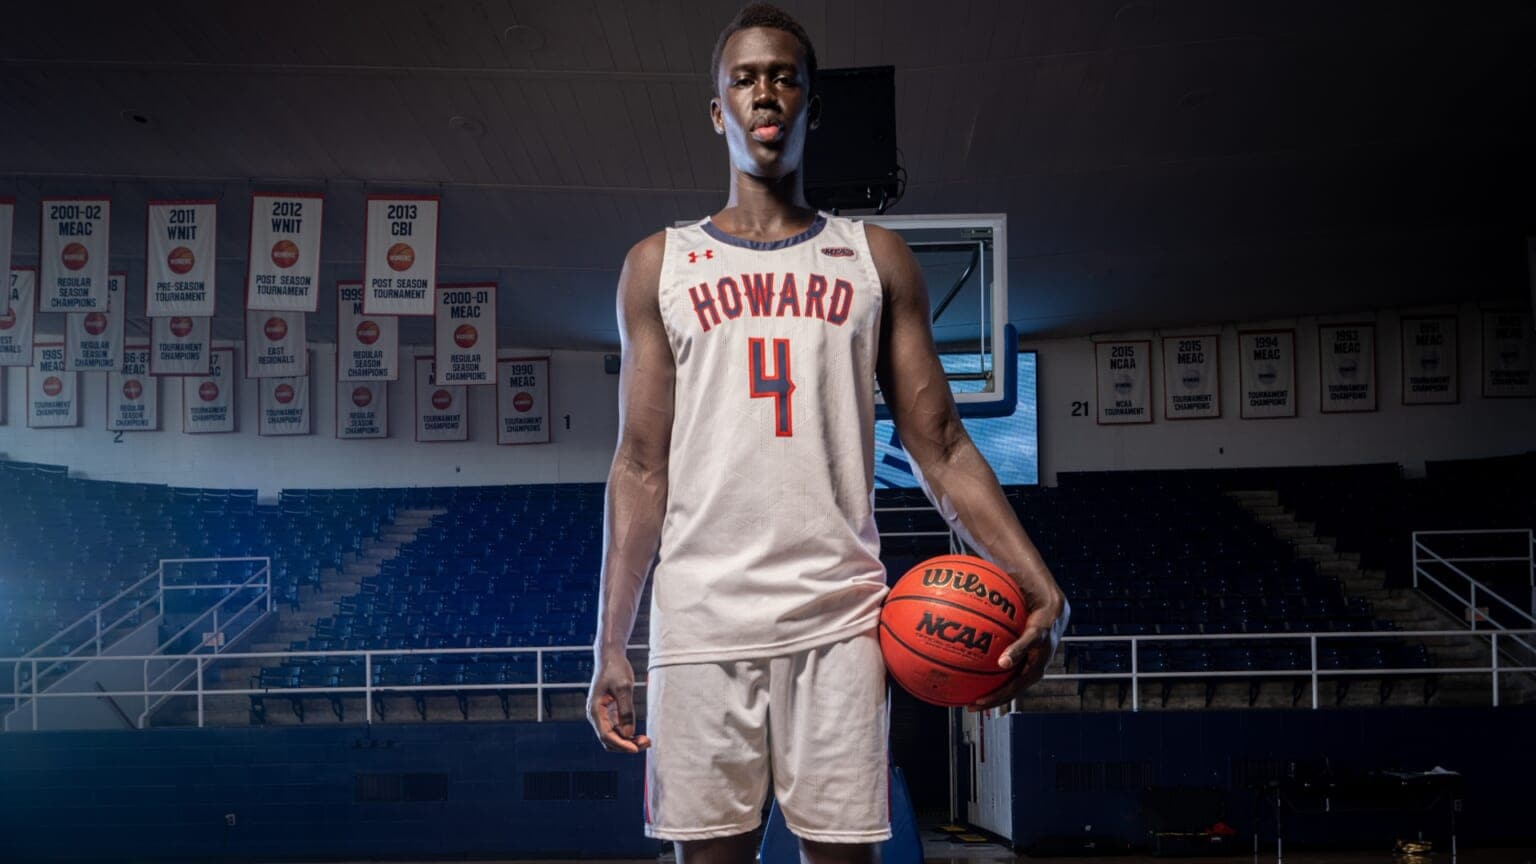 Apple docuseries to follow Howard U. basketball star Makur Maker